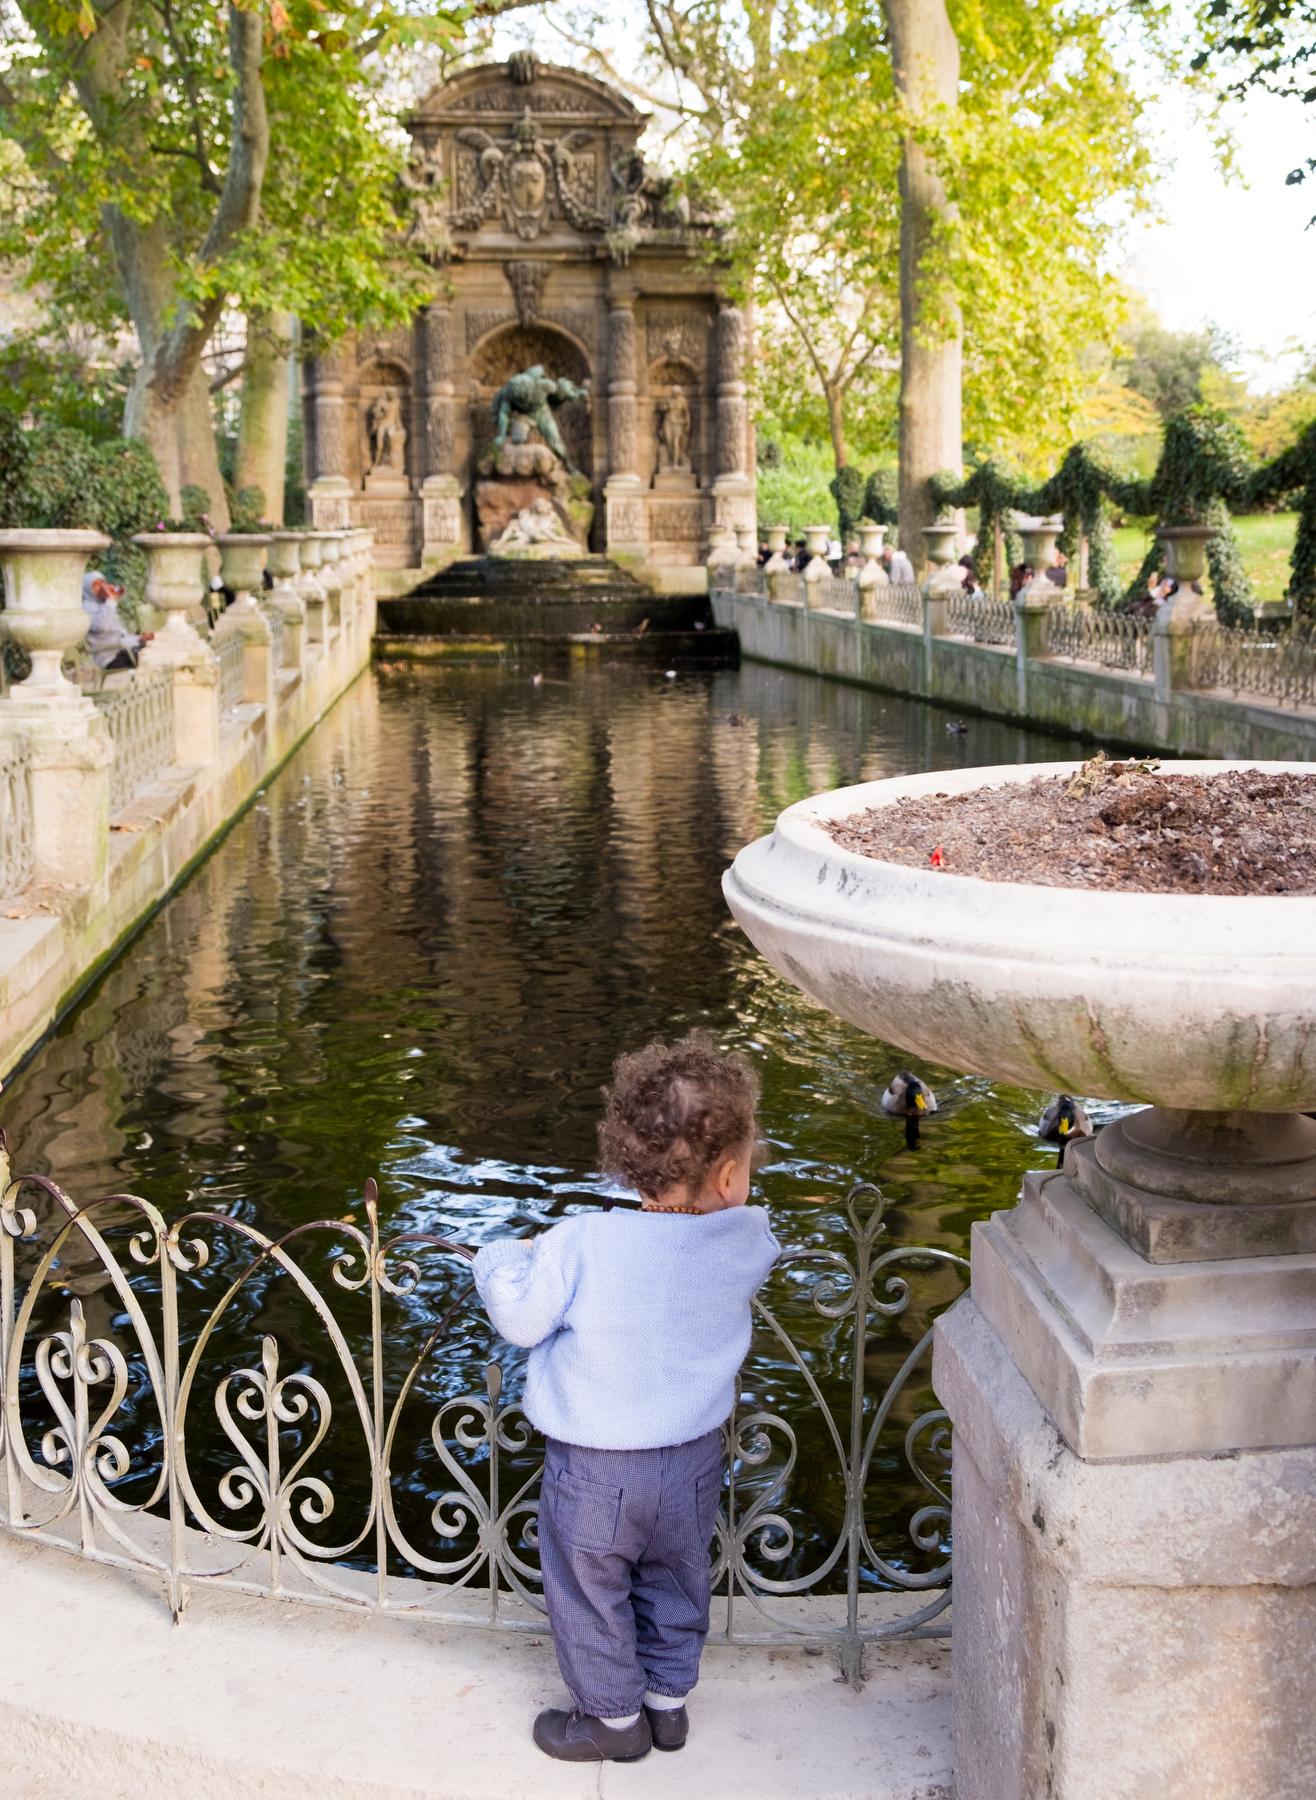 Paris'  Jardin du Luxembourg